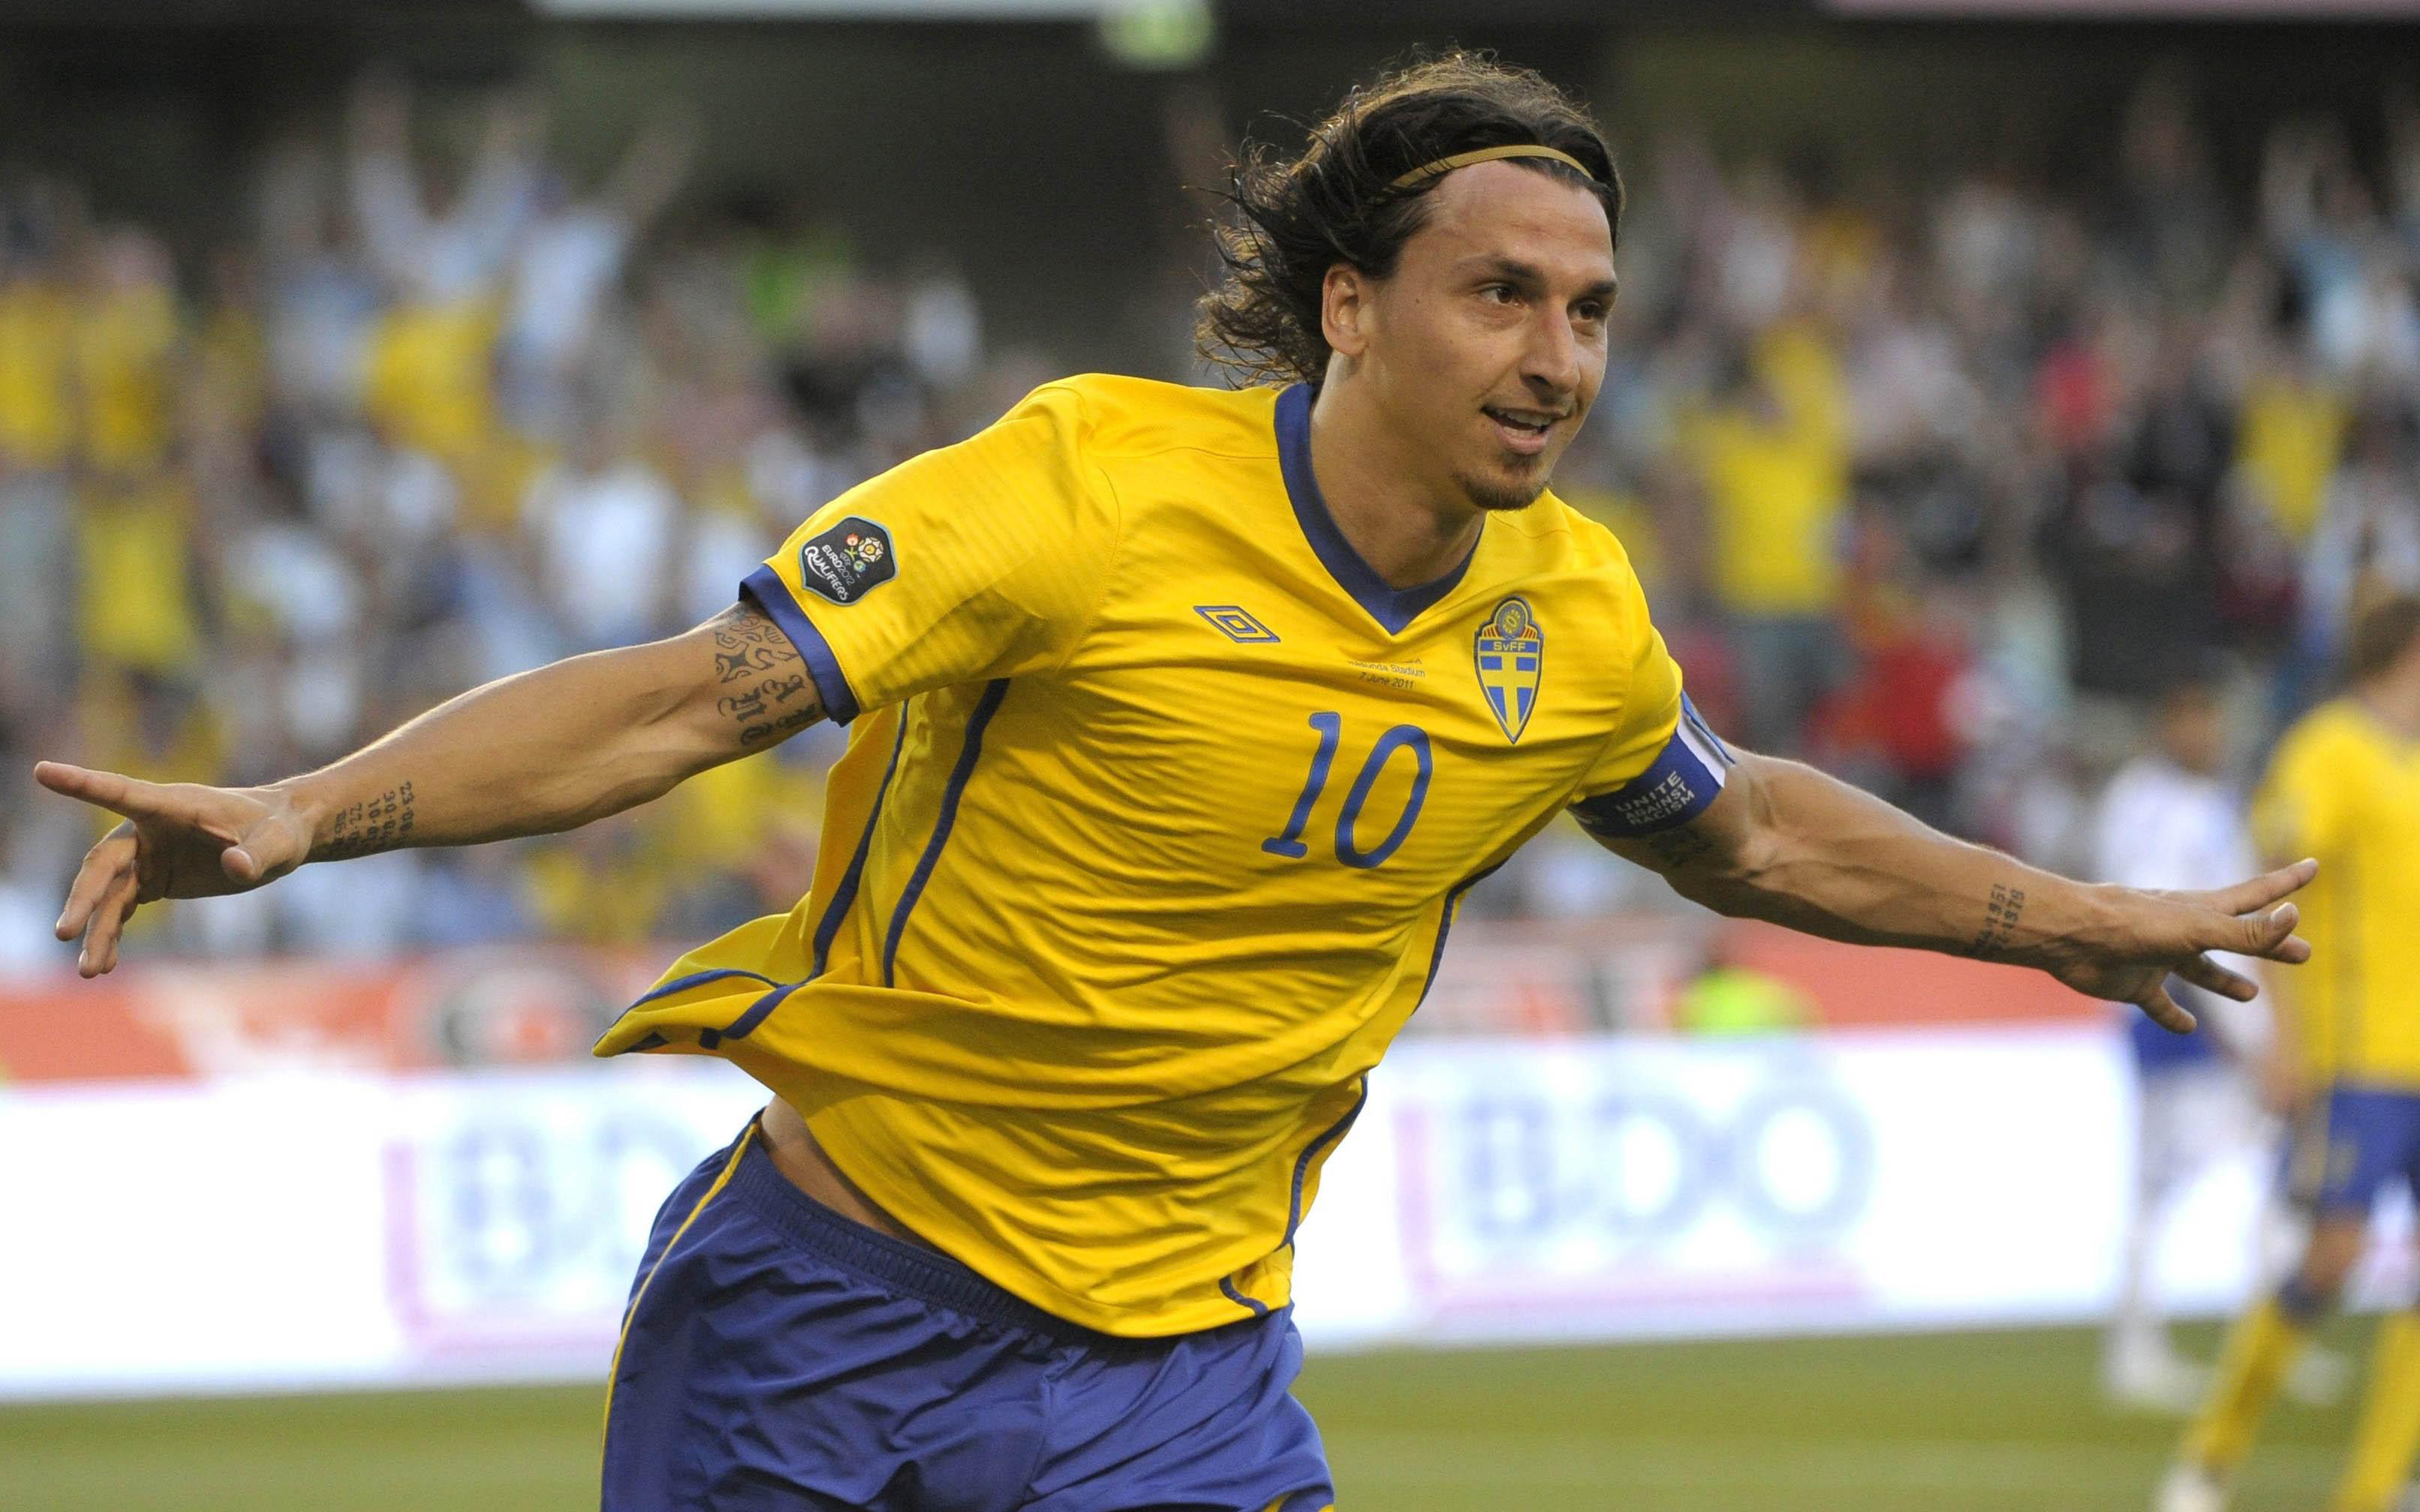 Sweden Football tickets - Buy Sweden Football Tickets 2016 - Tickets for Sweden Football3224 x 2015